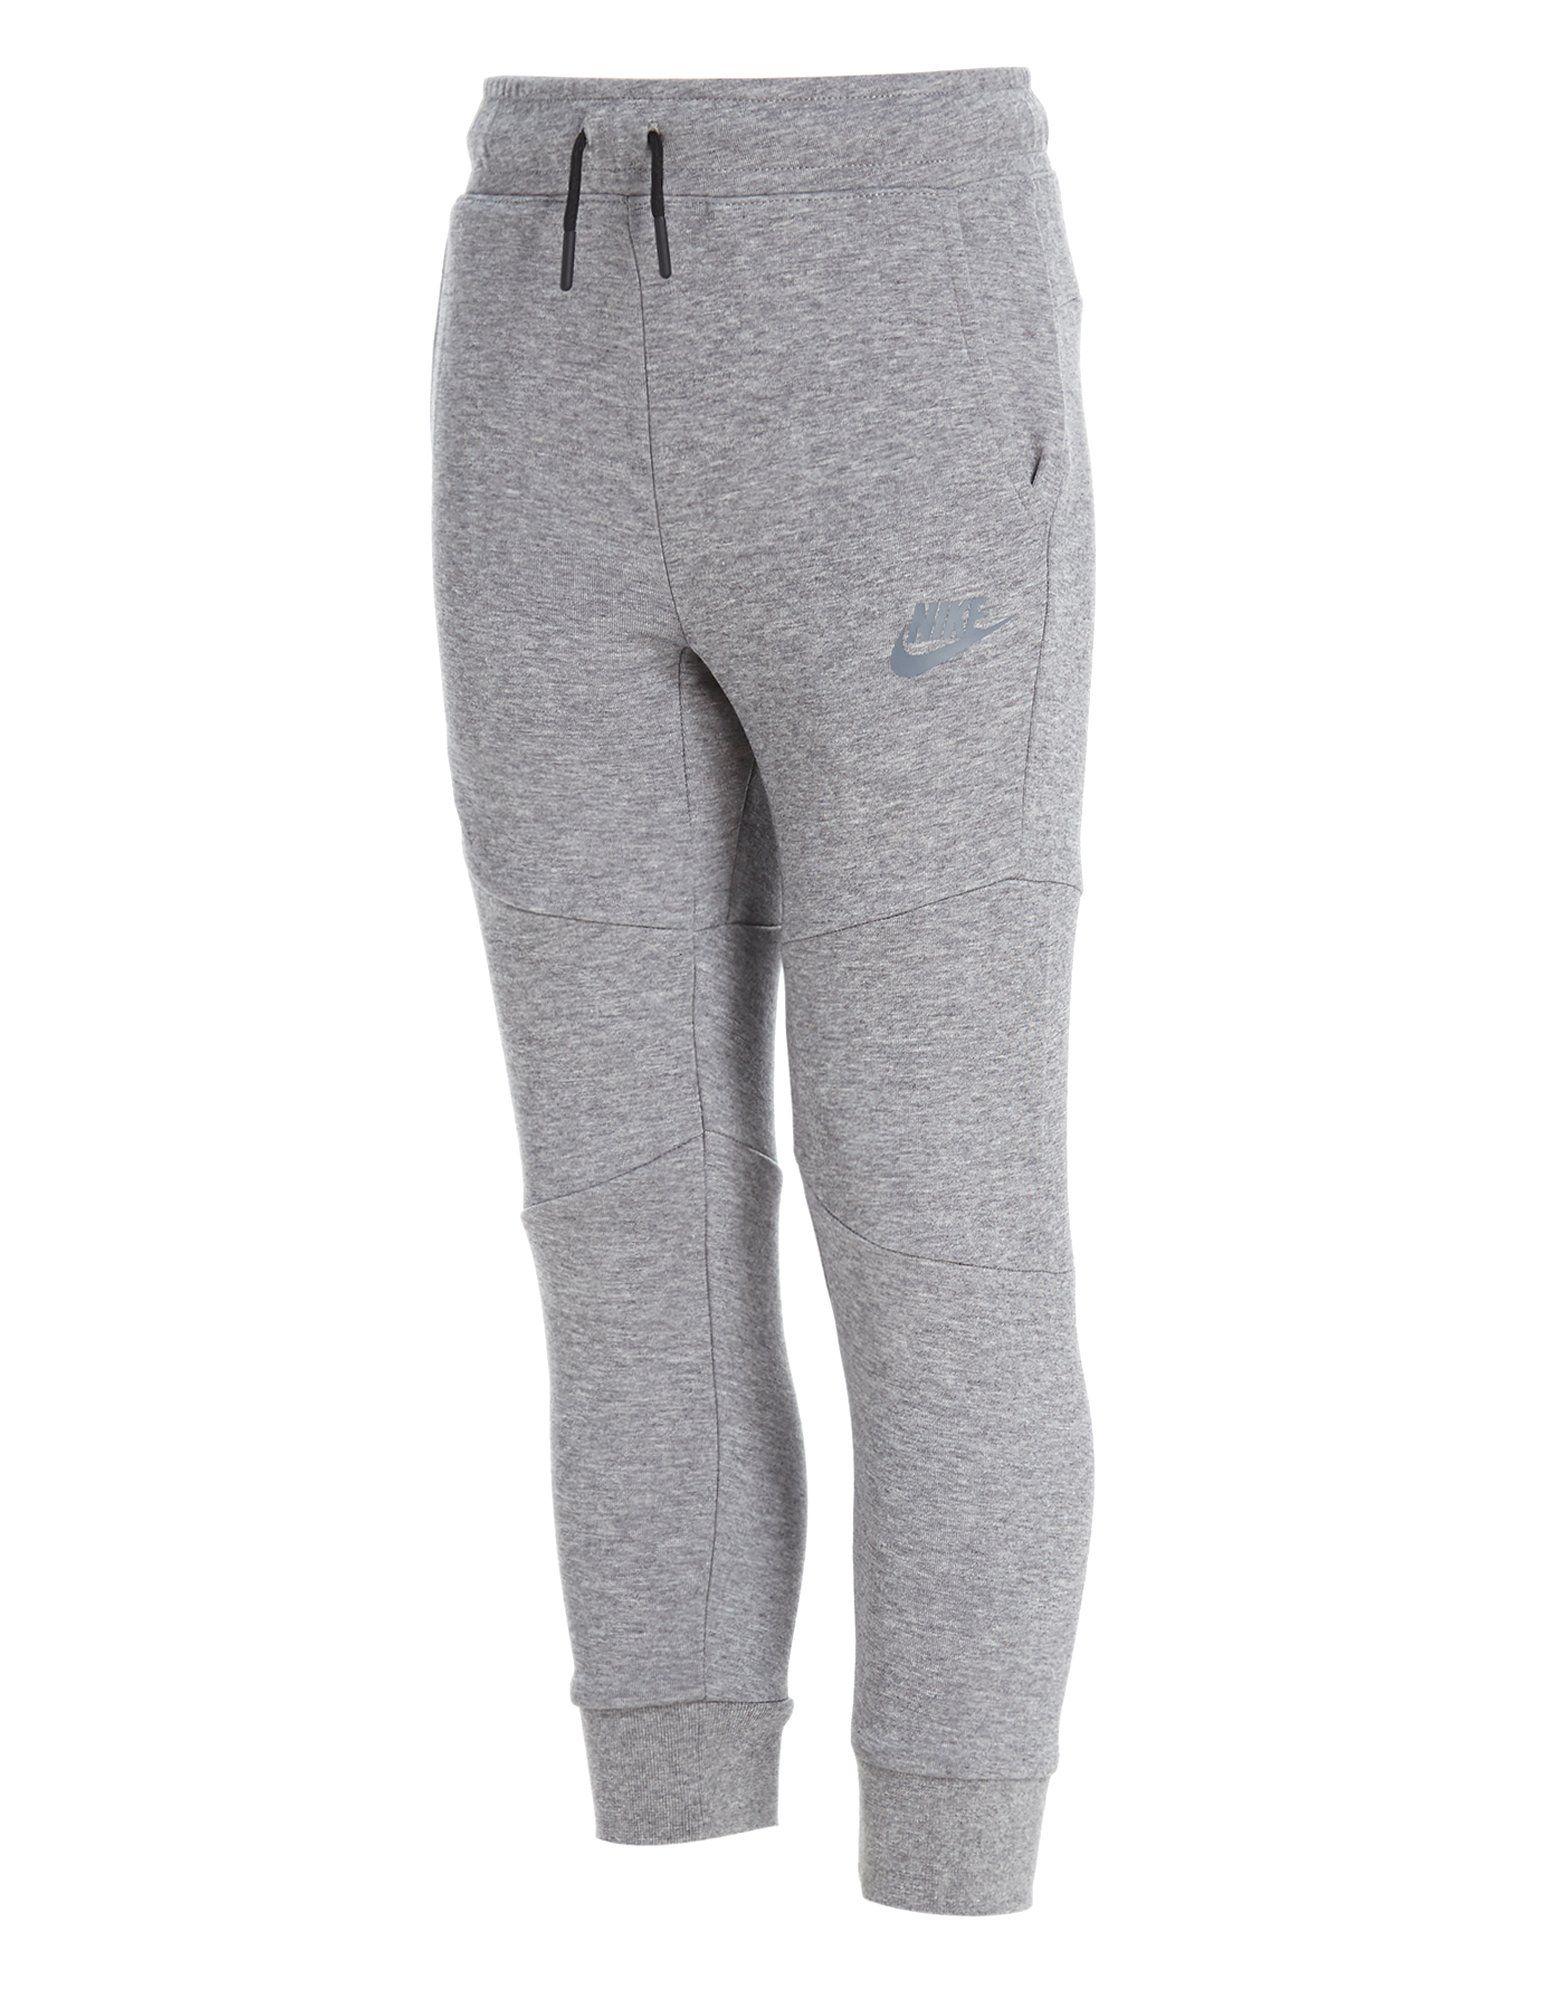 Nike Tech Fleece Pants Children  b071c8947